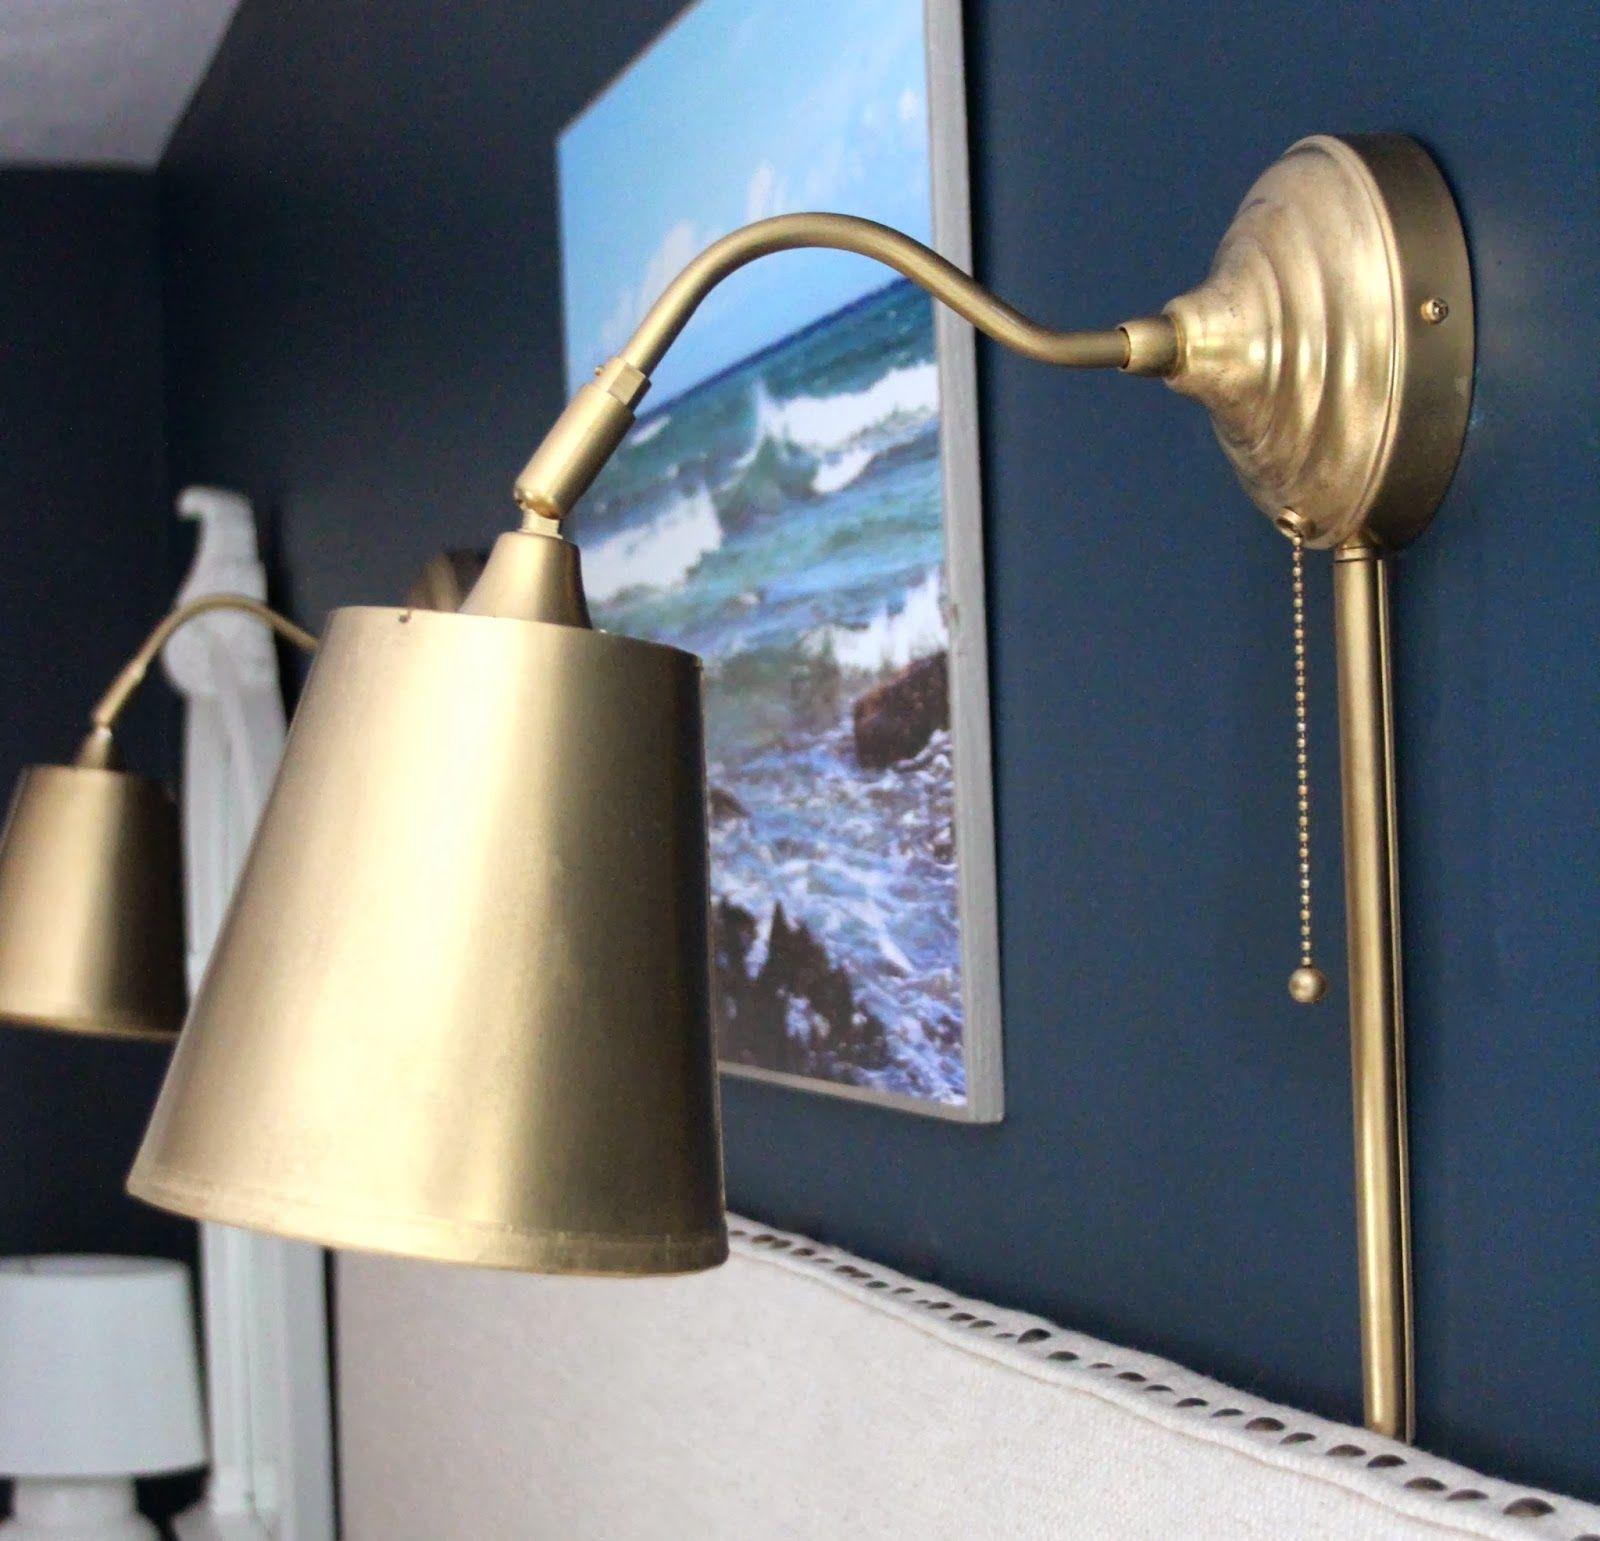 ikea wall light hack ikea wall lights ikea wall lamp on wall hacks id=26710